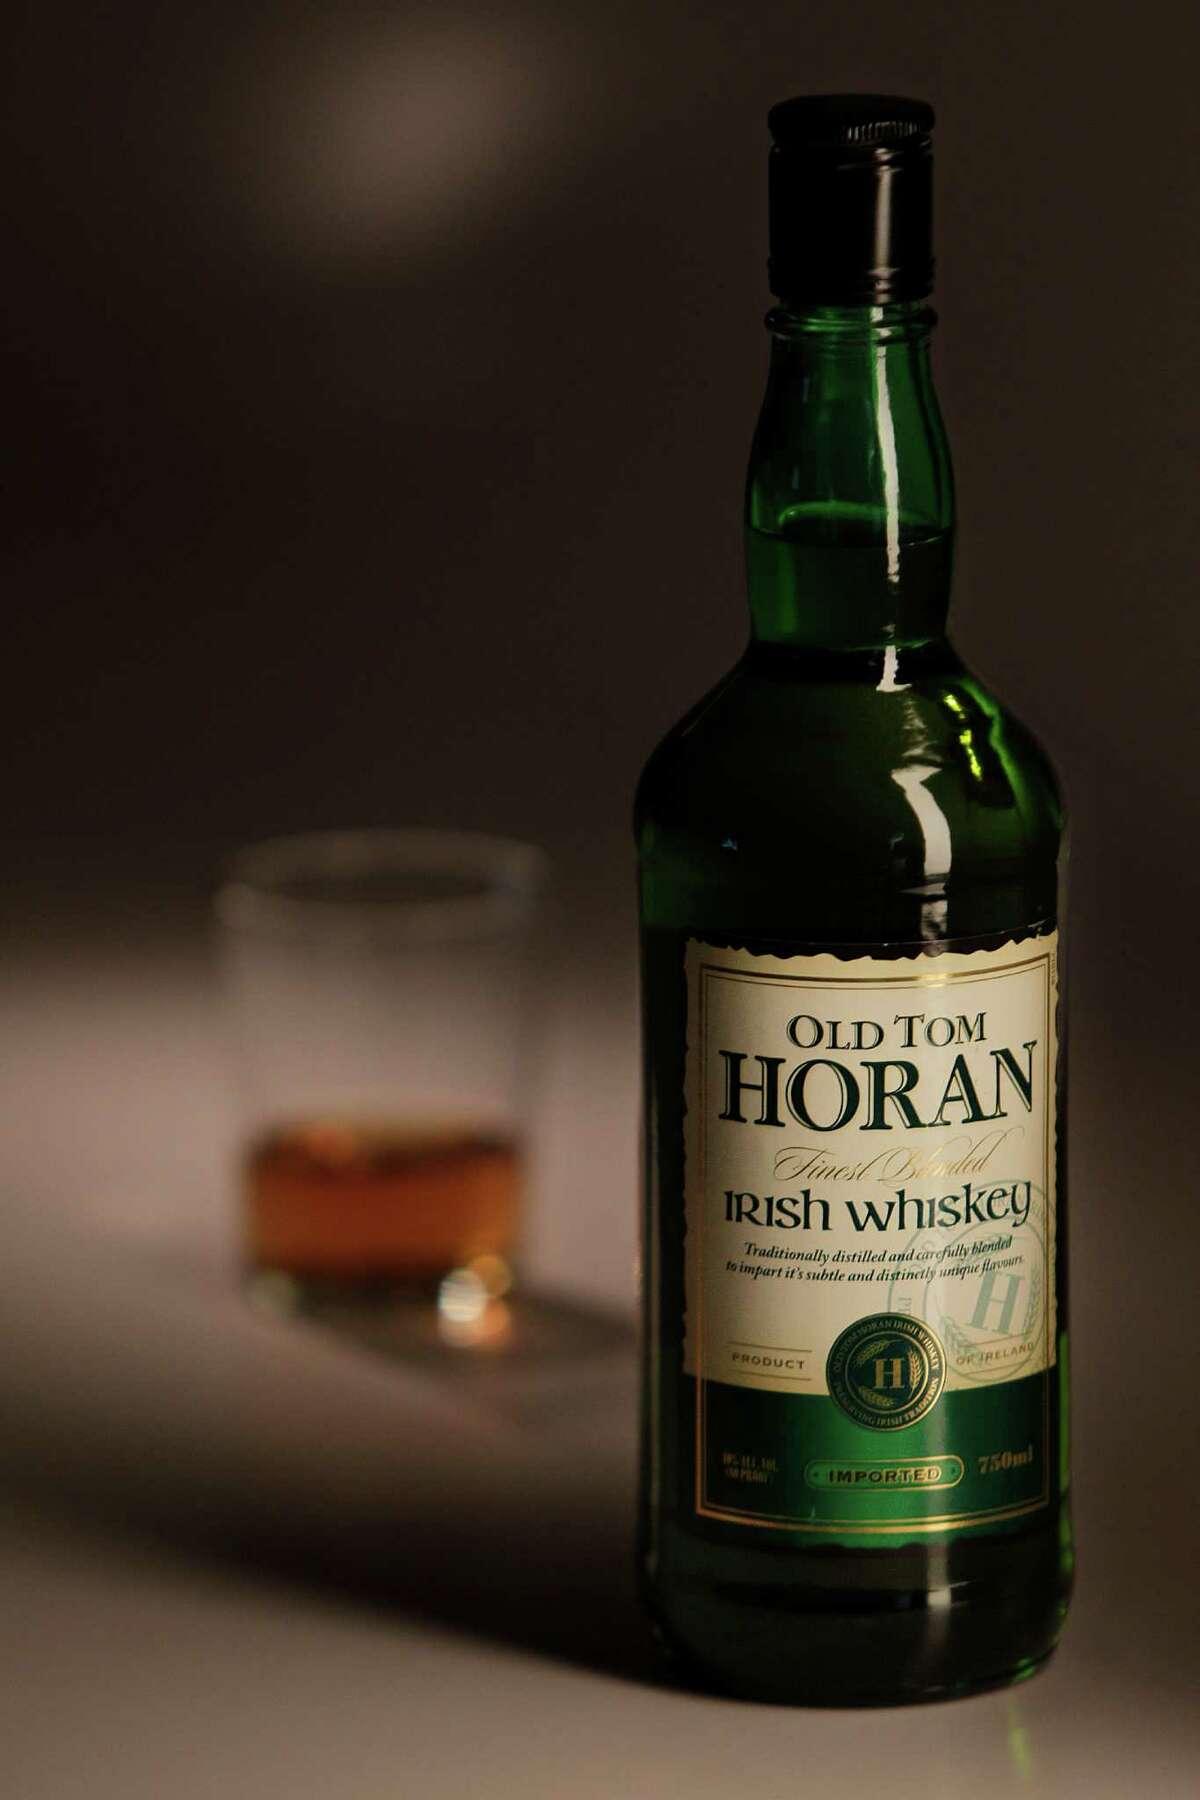 Old Tom Horan Irish Whiskey on July 8, 2014, in Houston, Tx. ( Mayra Beltran / Houston Chronicle )